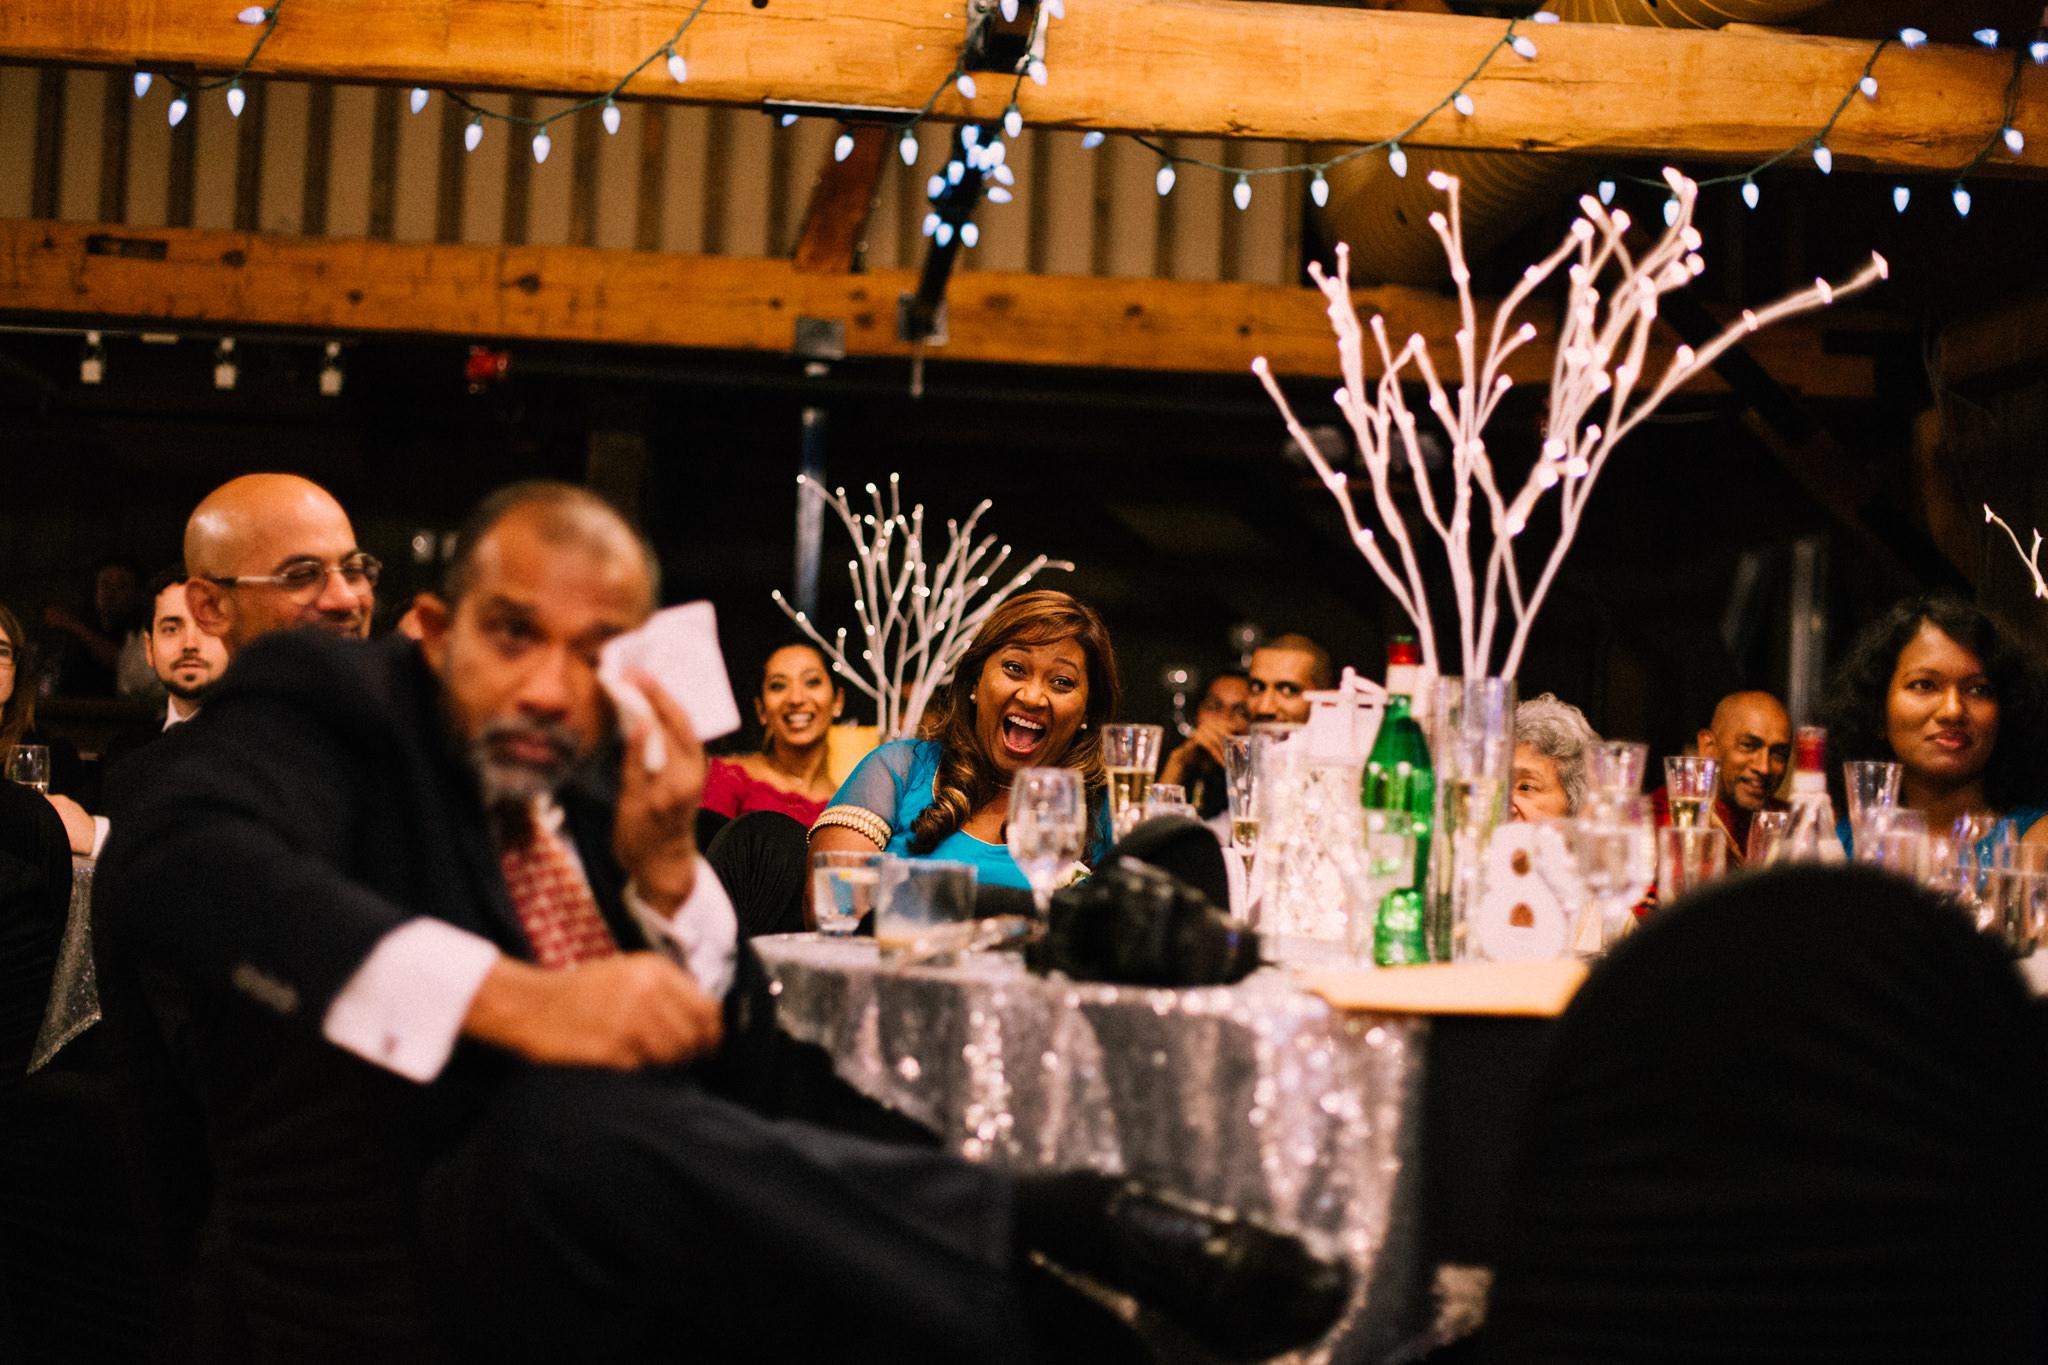 Backyard wedding in Brechin by Max Wong Photo (49)